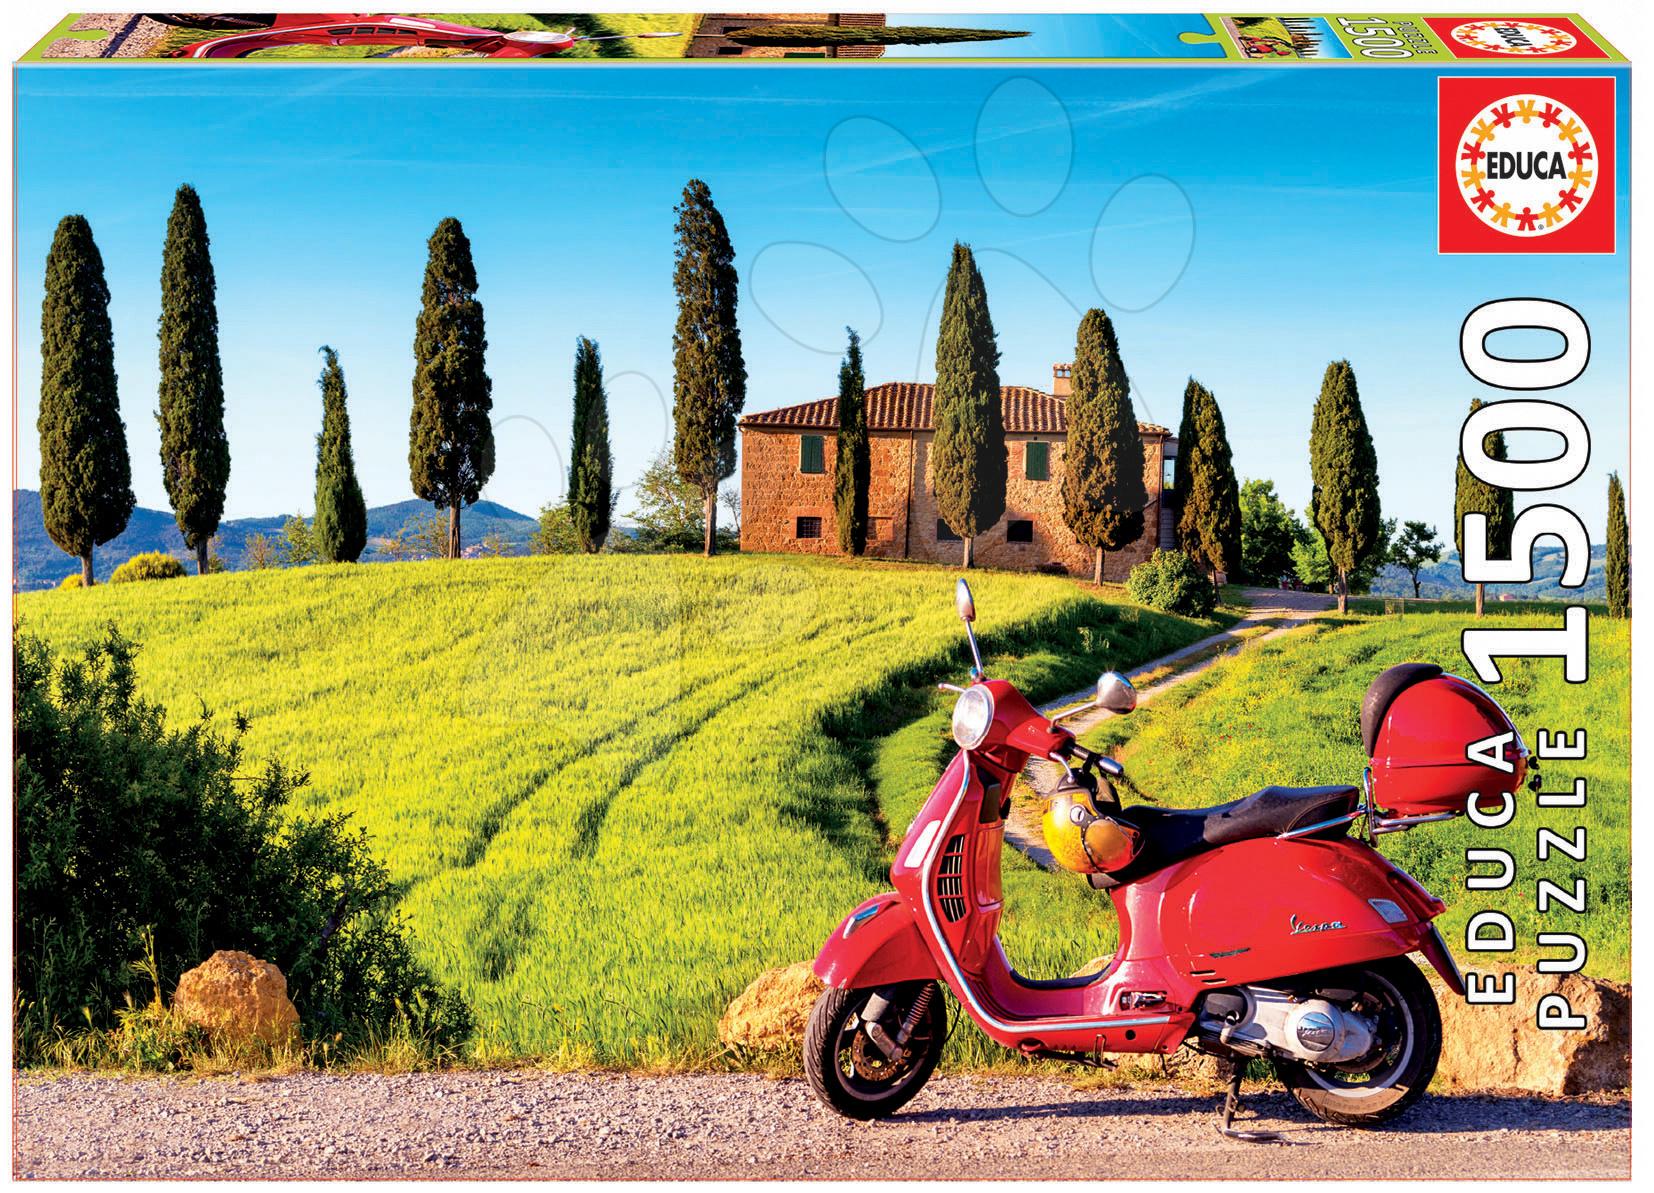 Puzzle Genuine Scooter in Toscana Educa 1500 dílů od 11 let